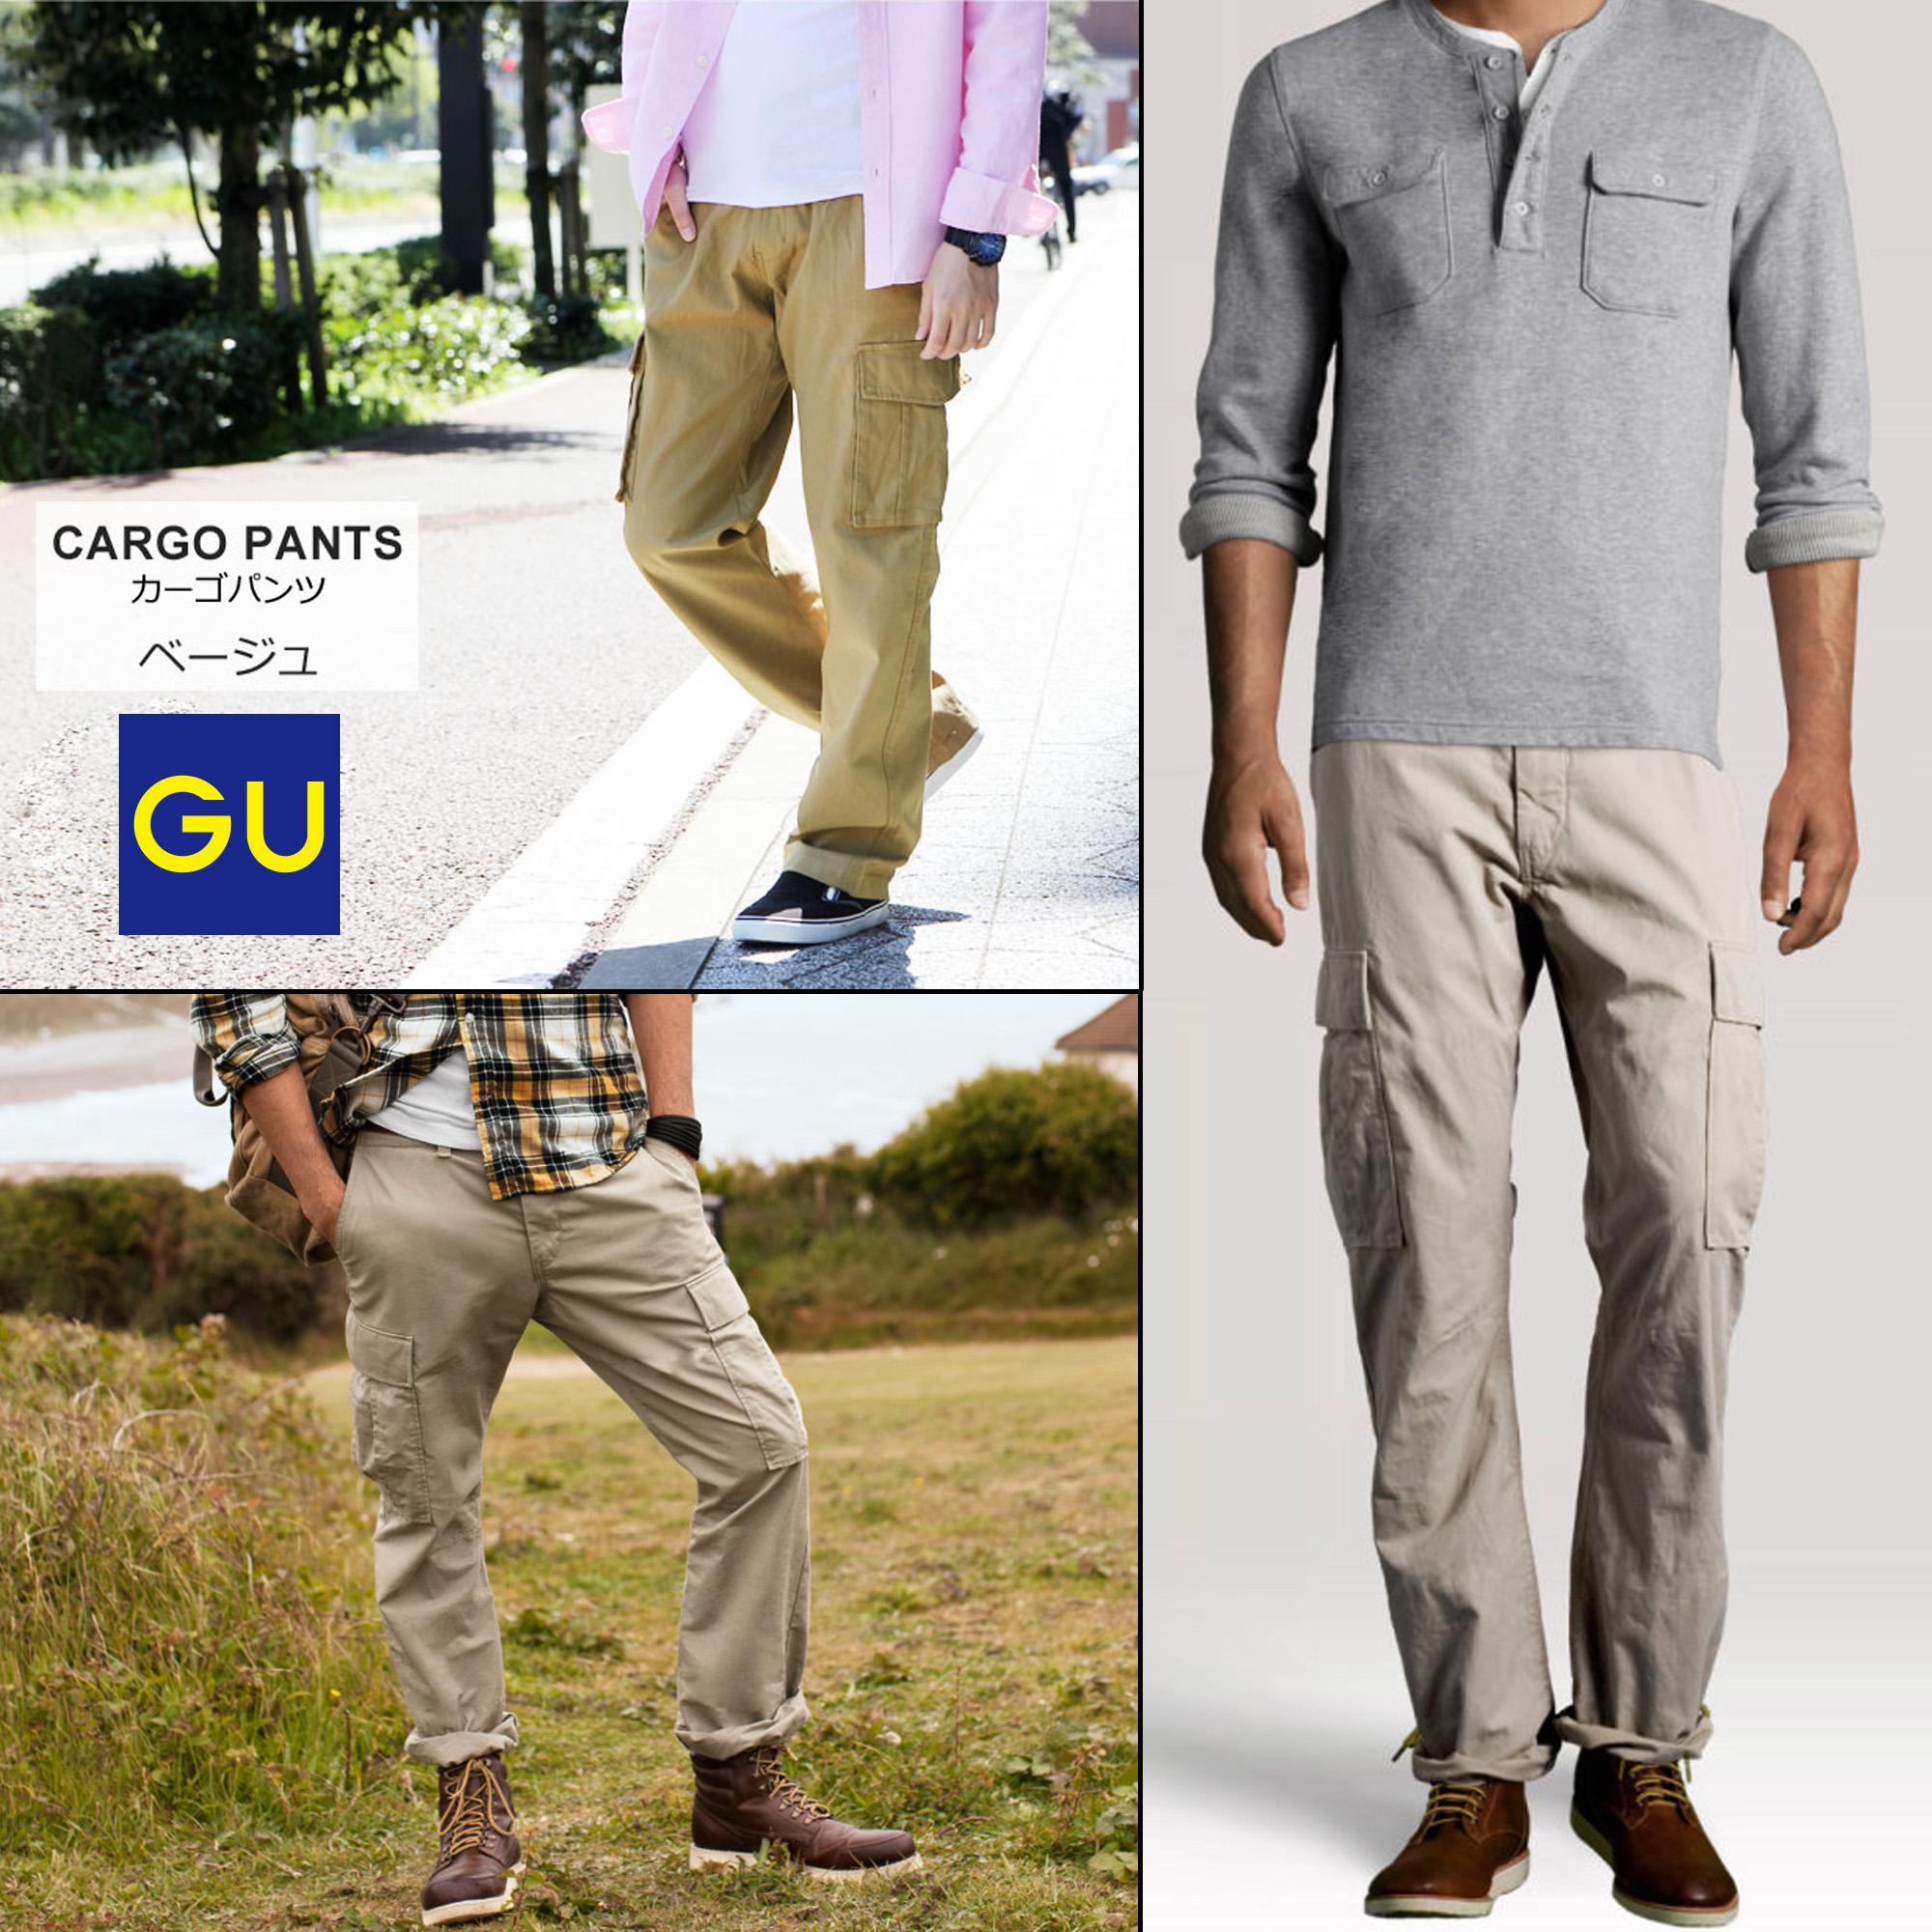 GU Cargo Pant